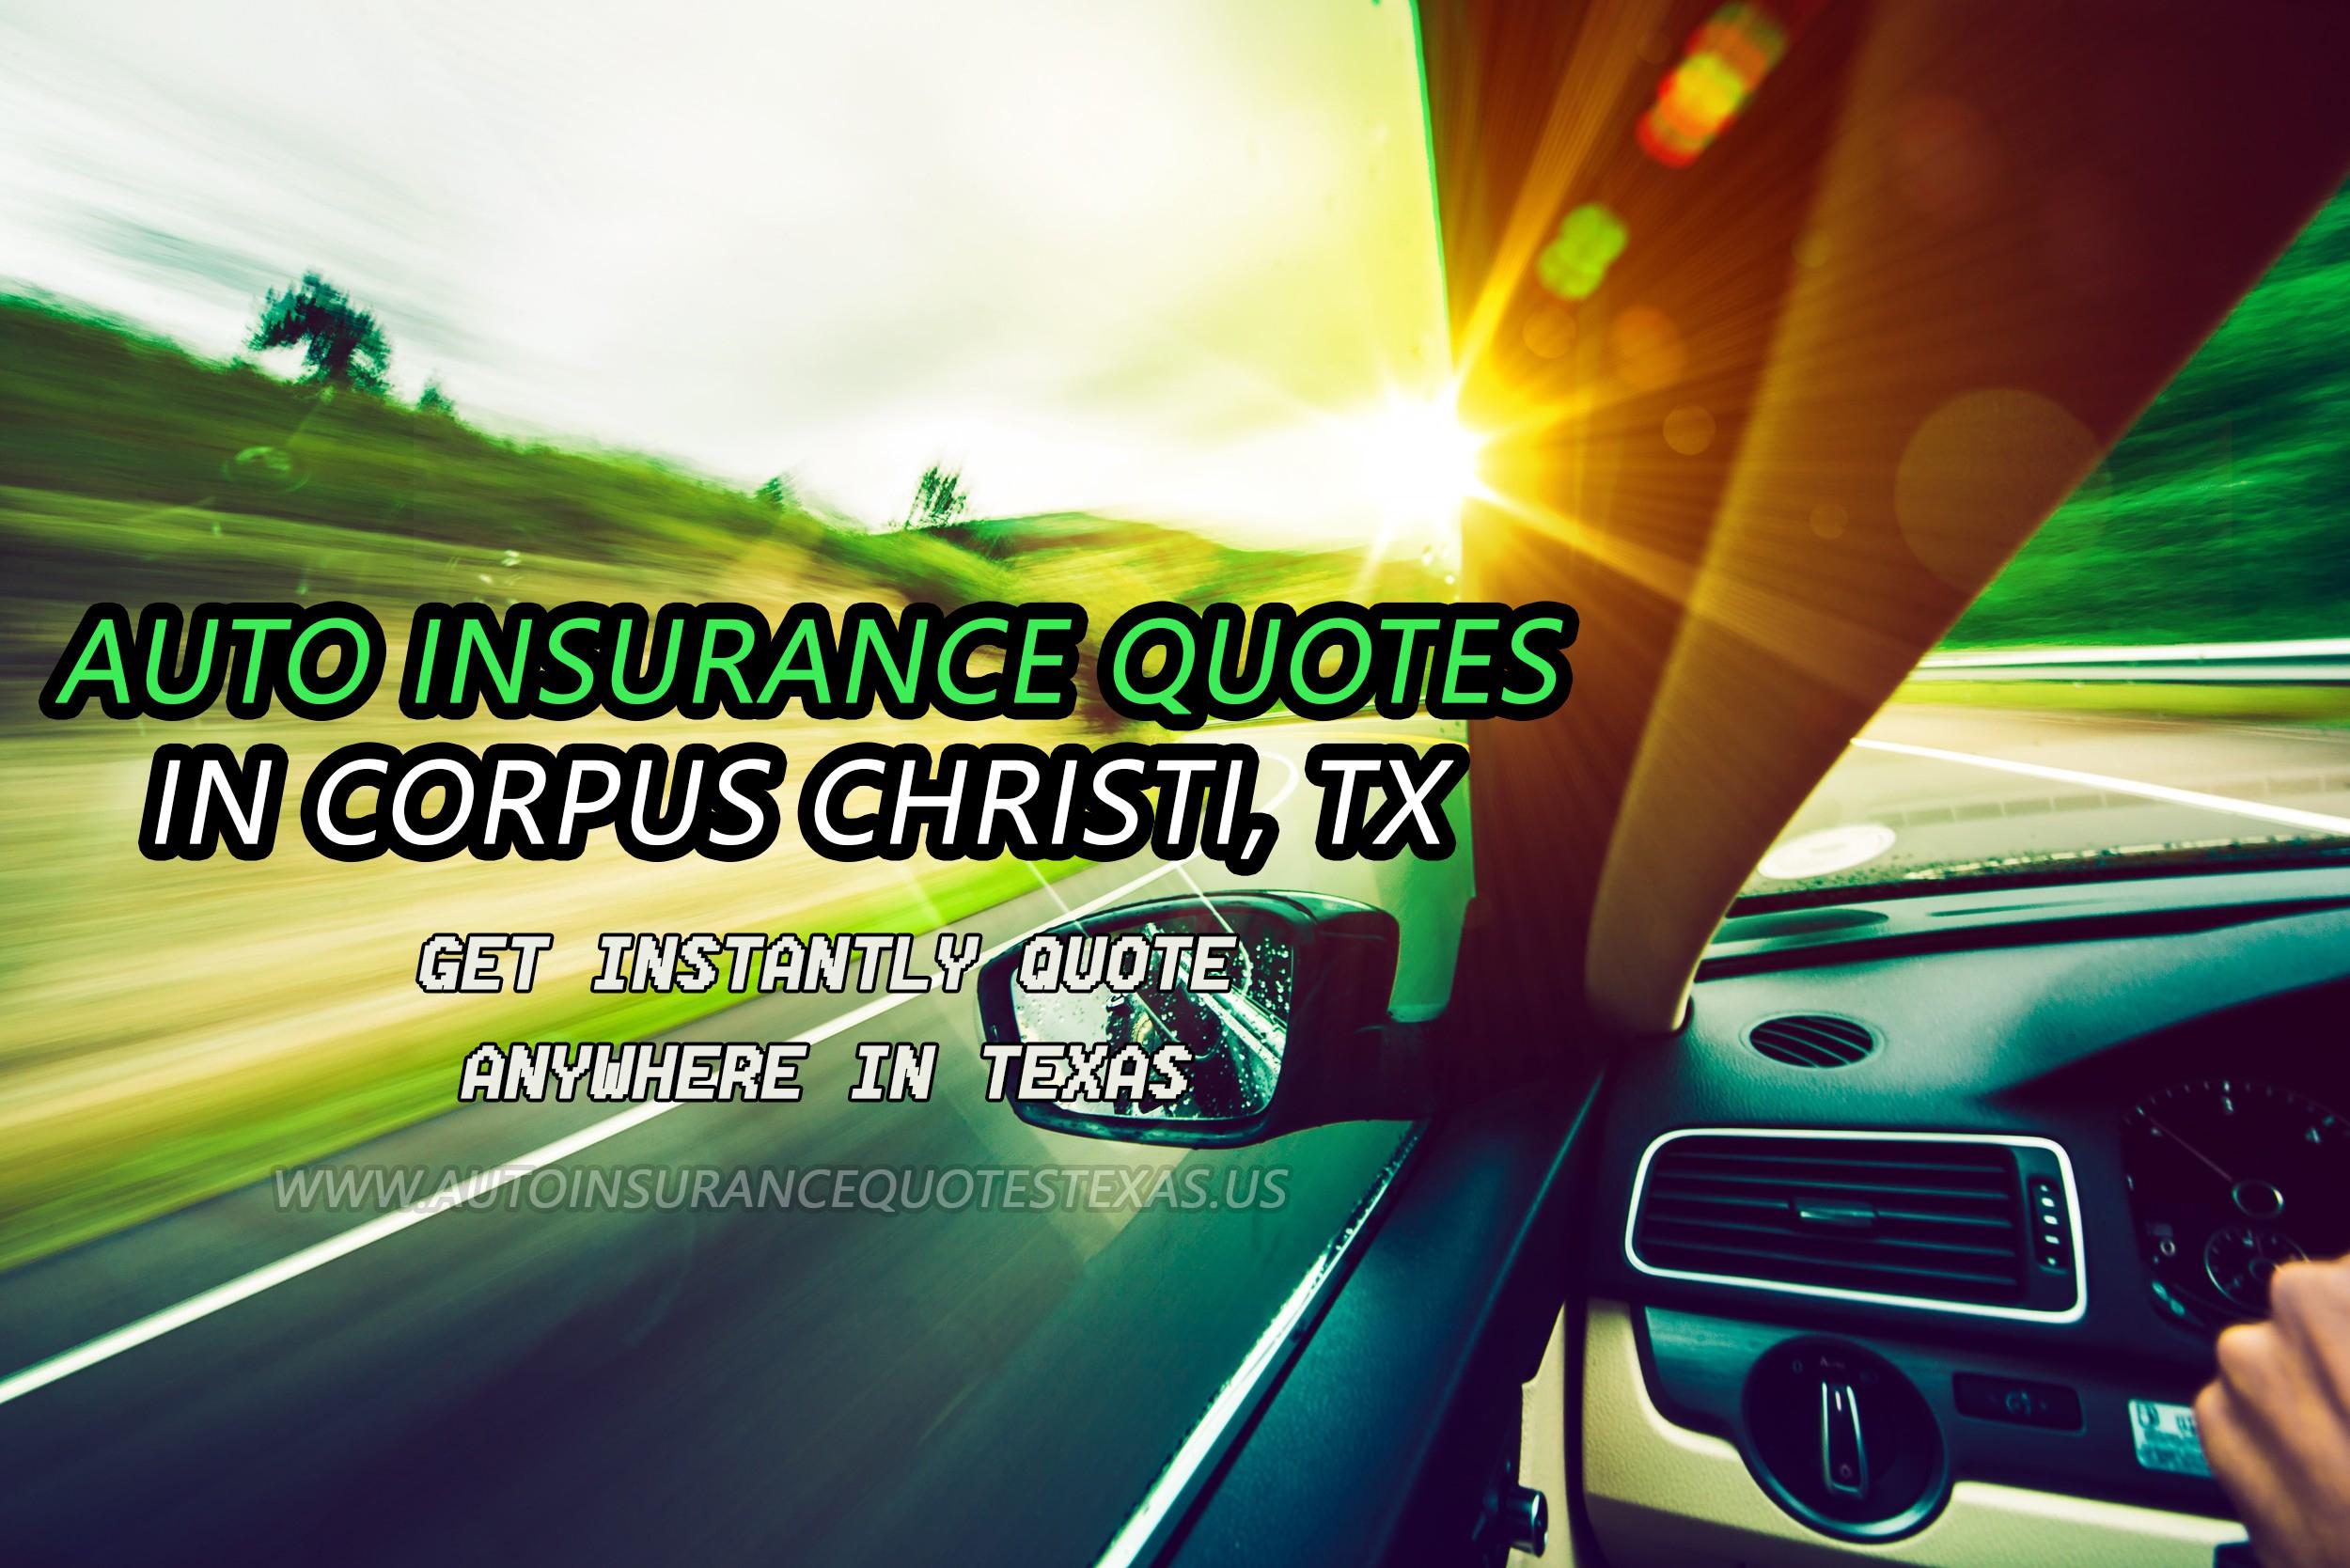 Auto Insurance Quotes in Corpus Christi, TX